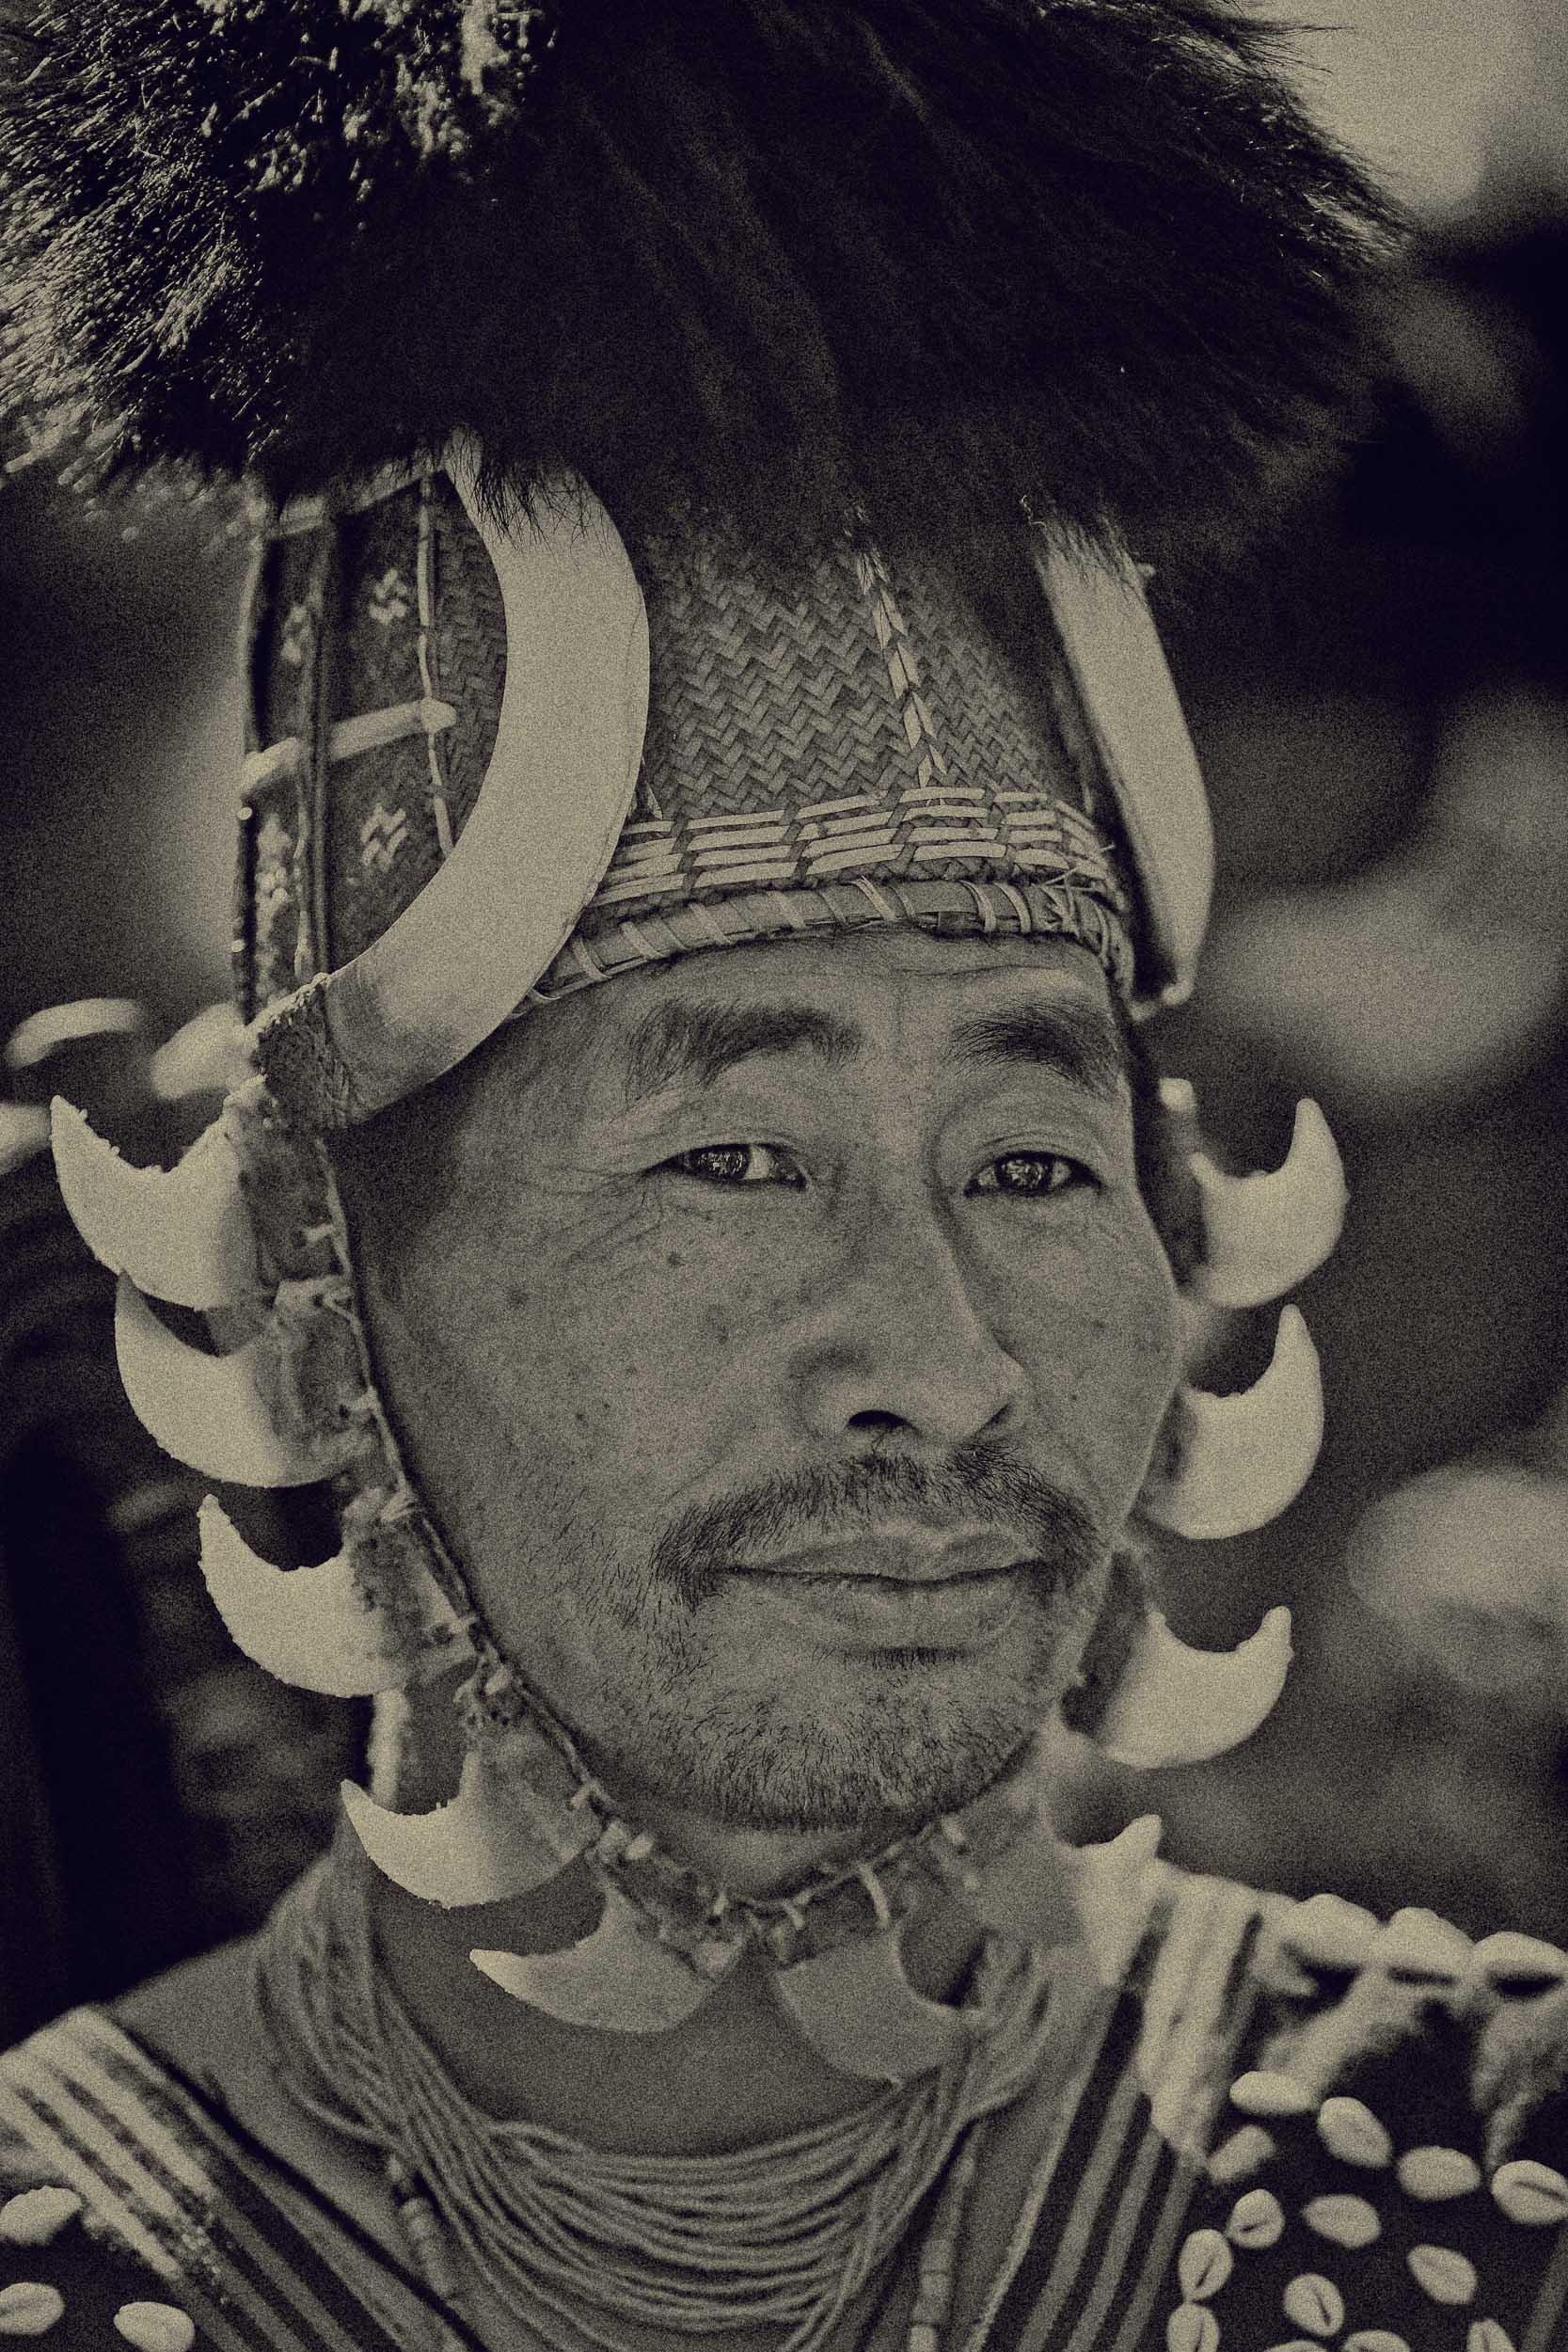 Sindhur_Photography_Travel_People_Nagaland-2.JPG